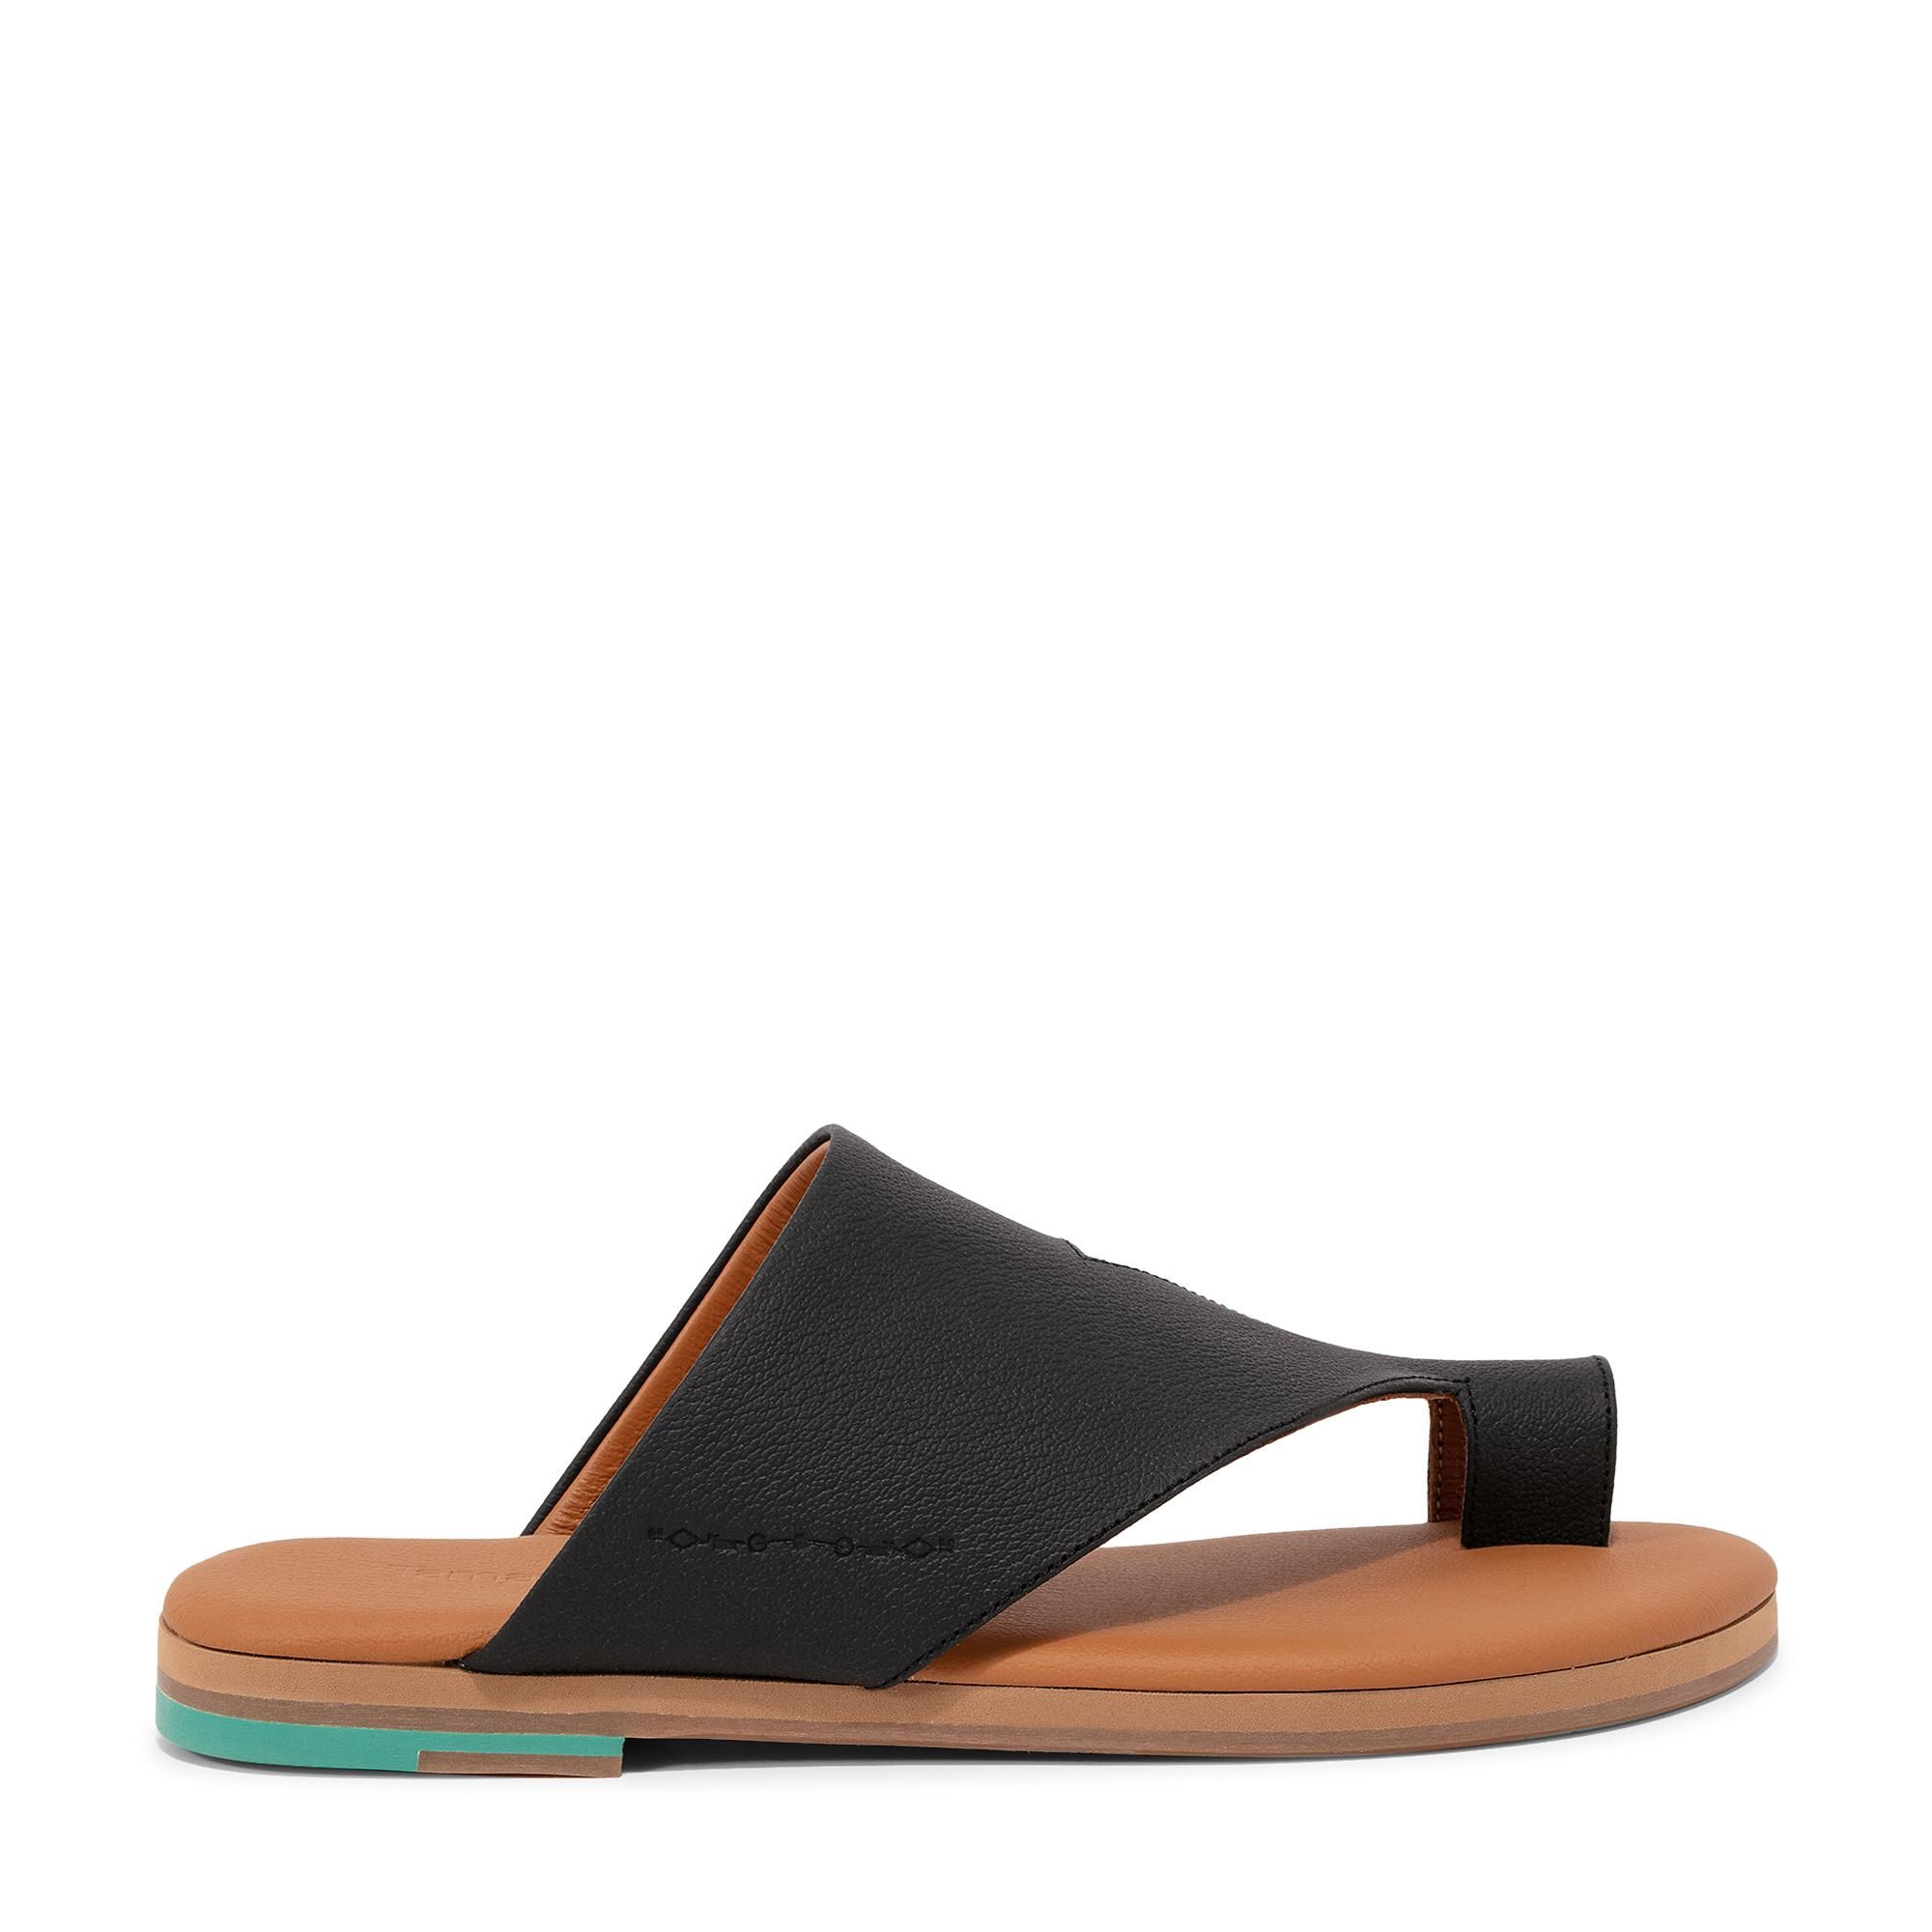 Waaw sandals